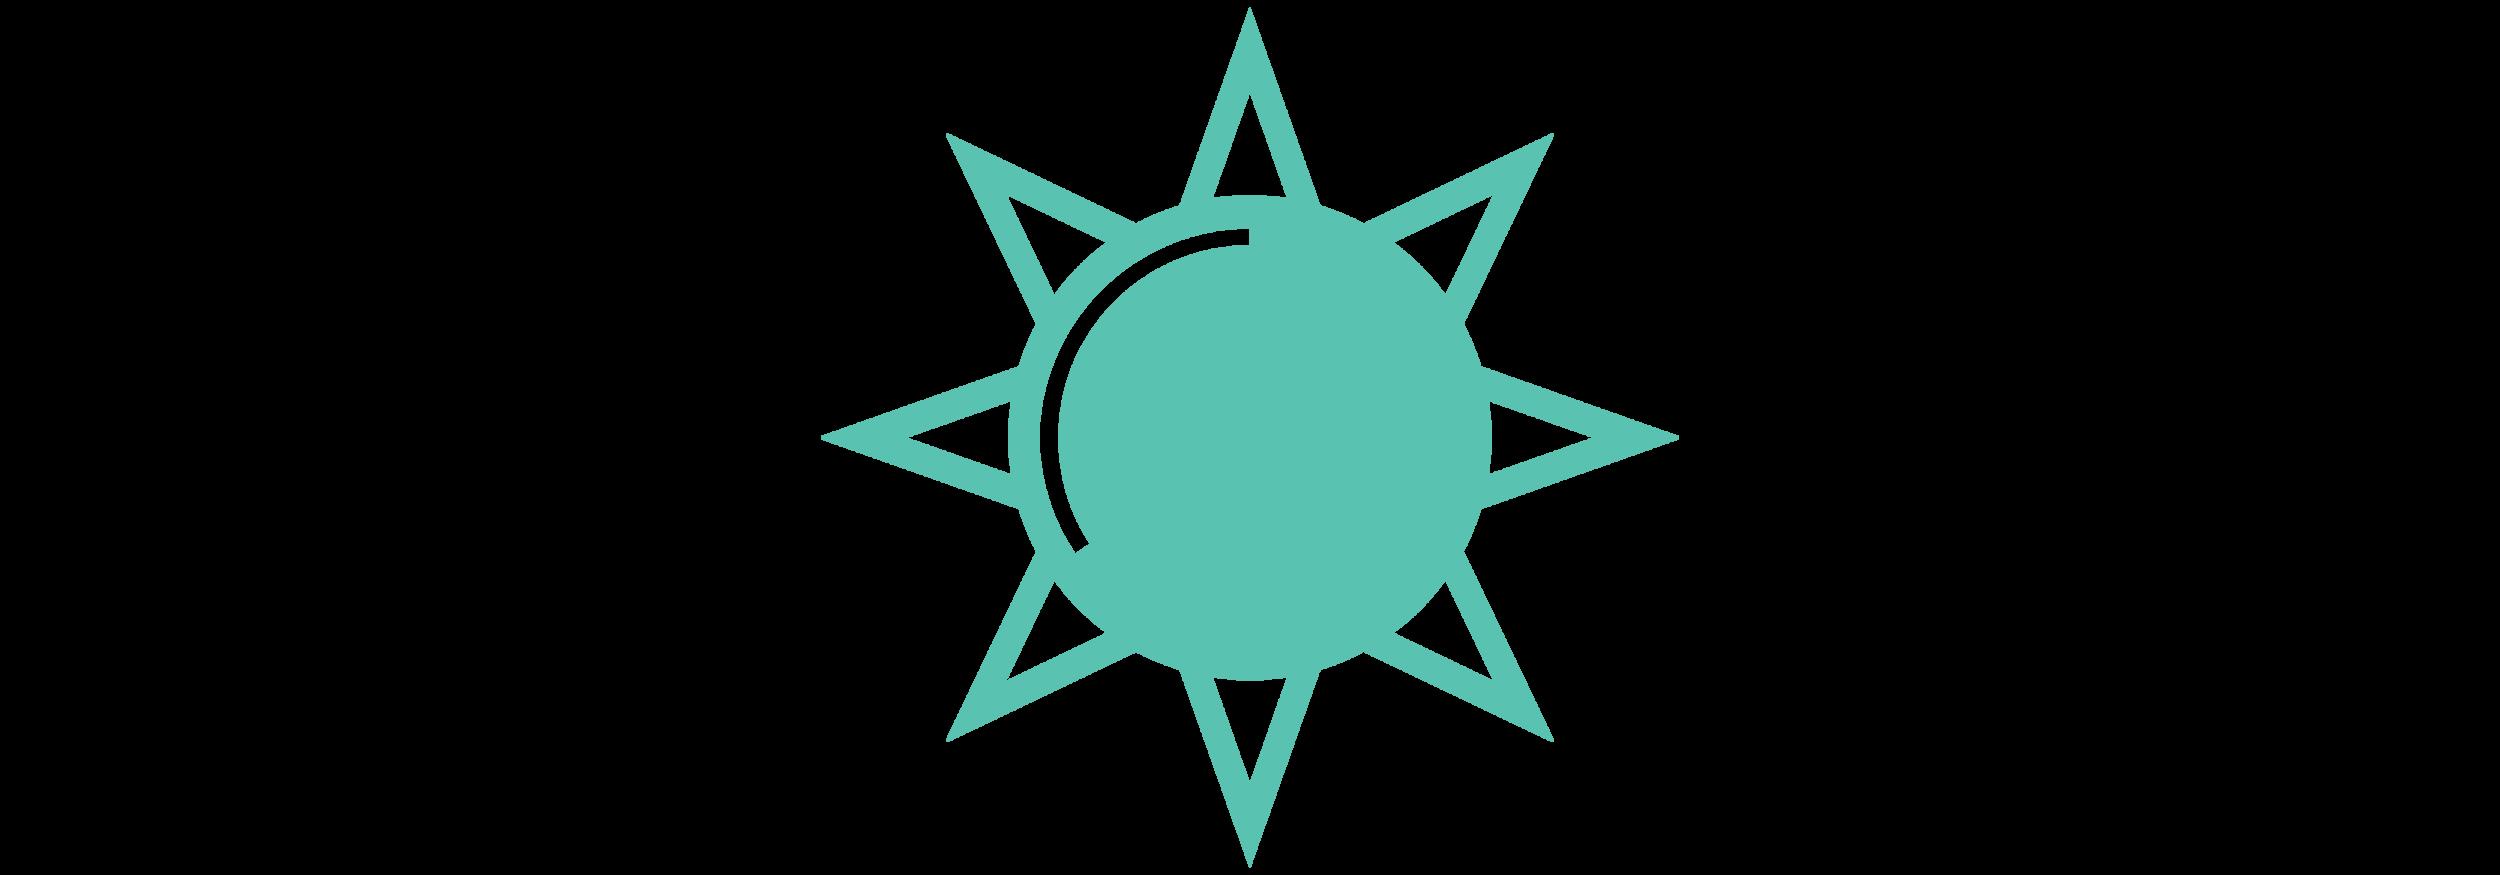 sunbeam_icon-01.png